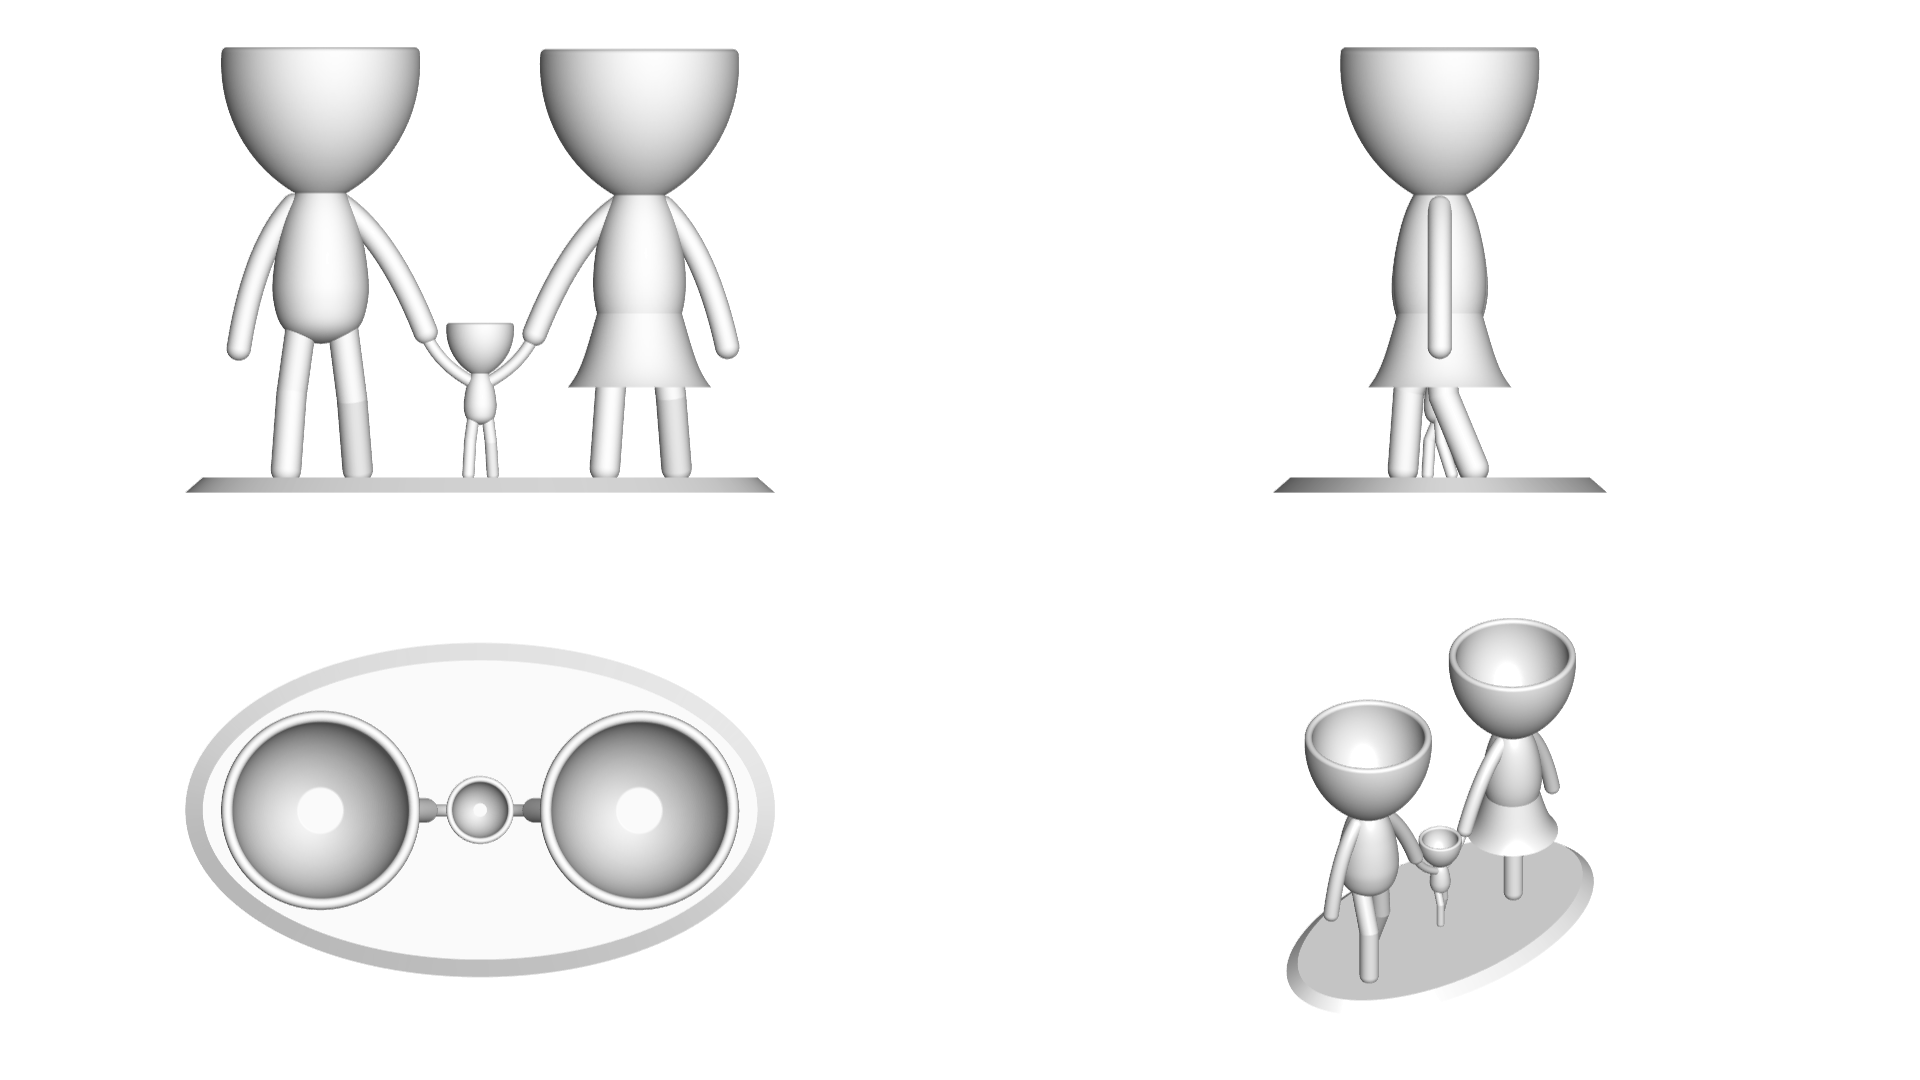 Familia_Blanco_2.png Download free STL file Macetas Florero ROBERT plant familia mama papa hijo - FAMILY FLOWERPOT VASE MOTHER DAD SON / DAUGHTER • 3D printable object, PRODUSTL56